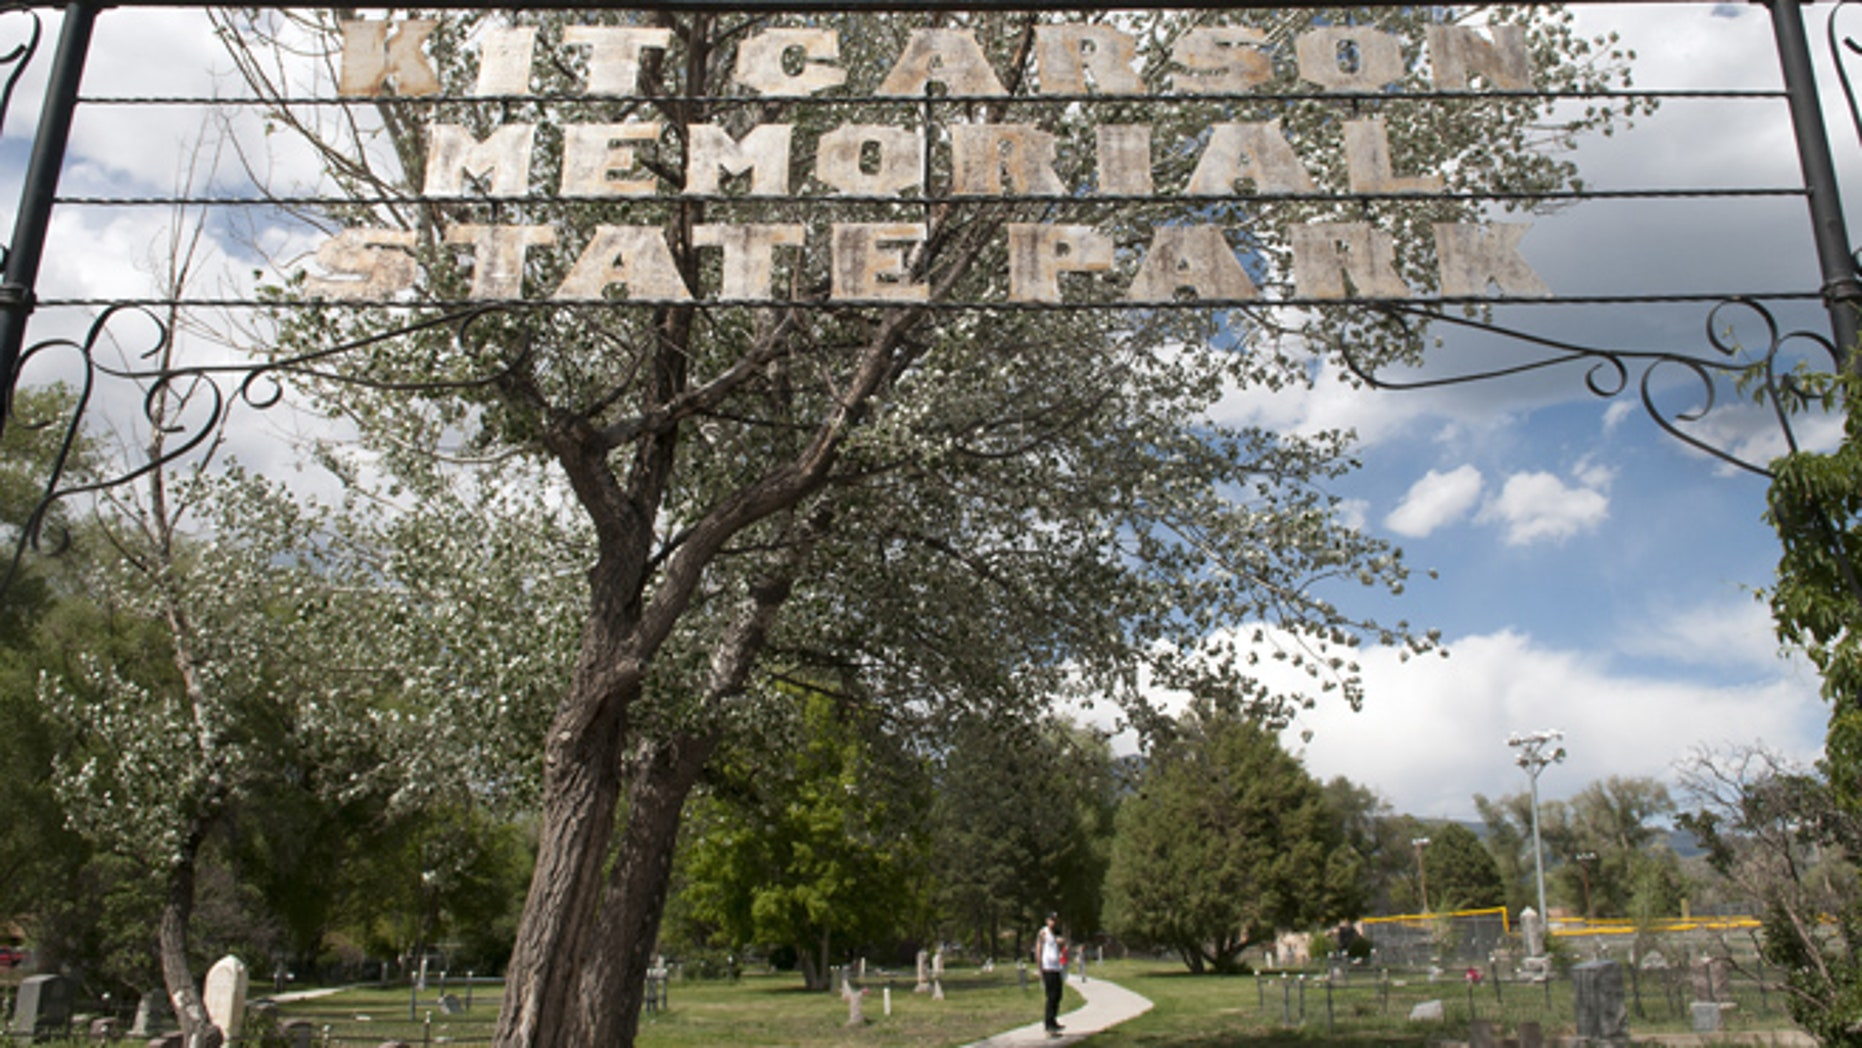 June 11, 2014: Devin Myers, from Taos, skateboards through Kit Carson Memorial Cemetery at Kit Carson Park in Taos, N.M.